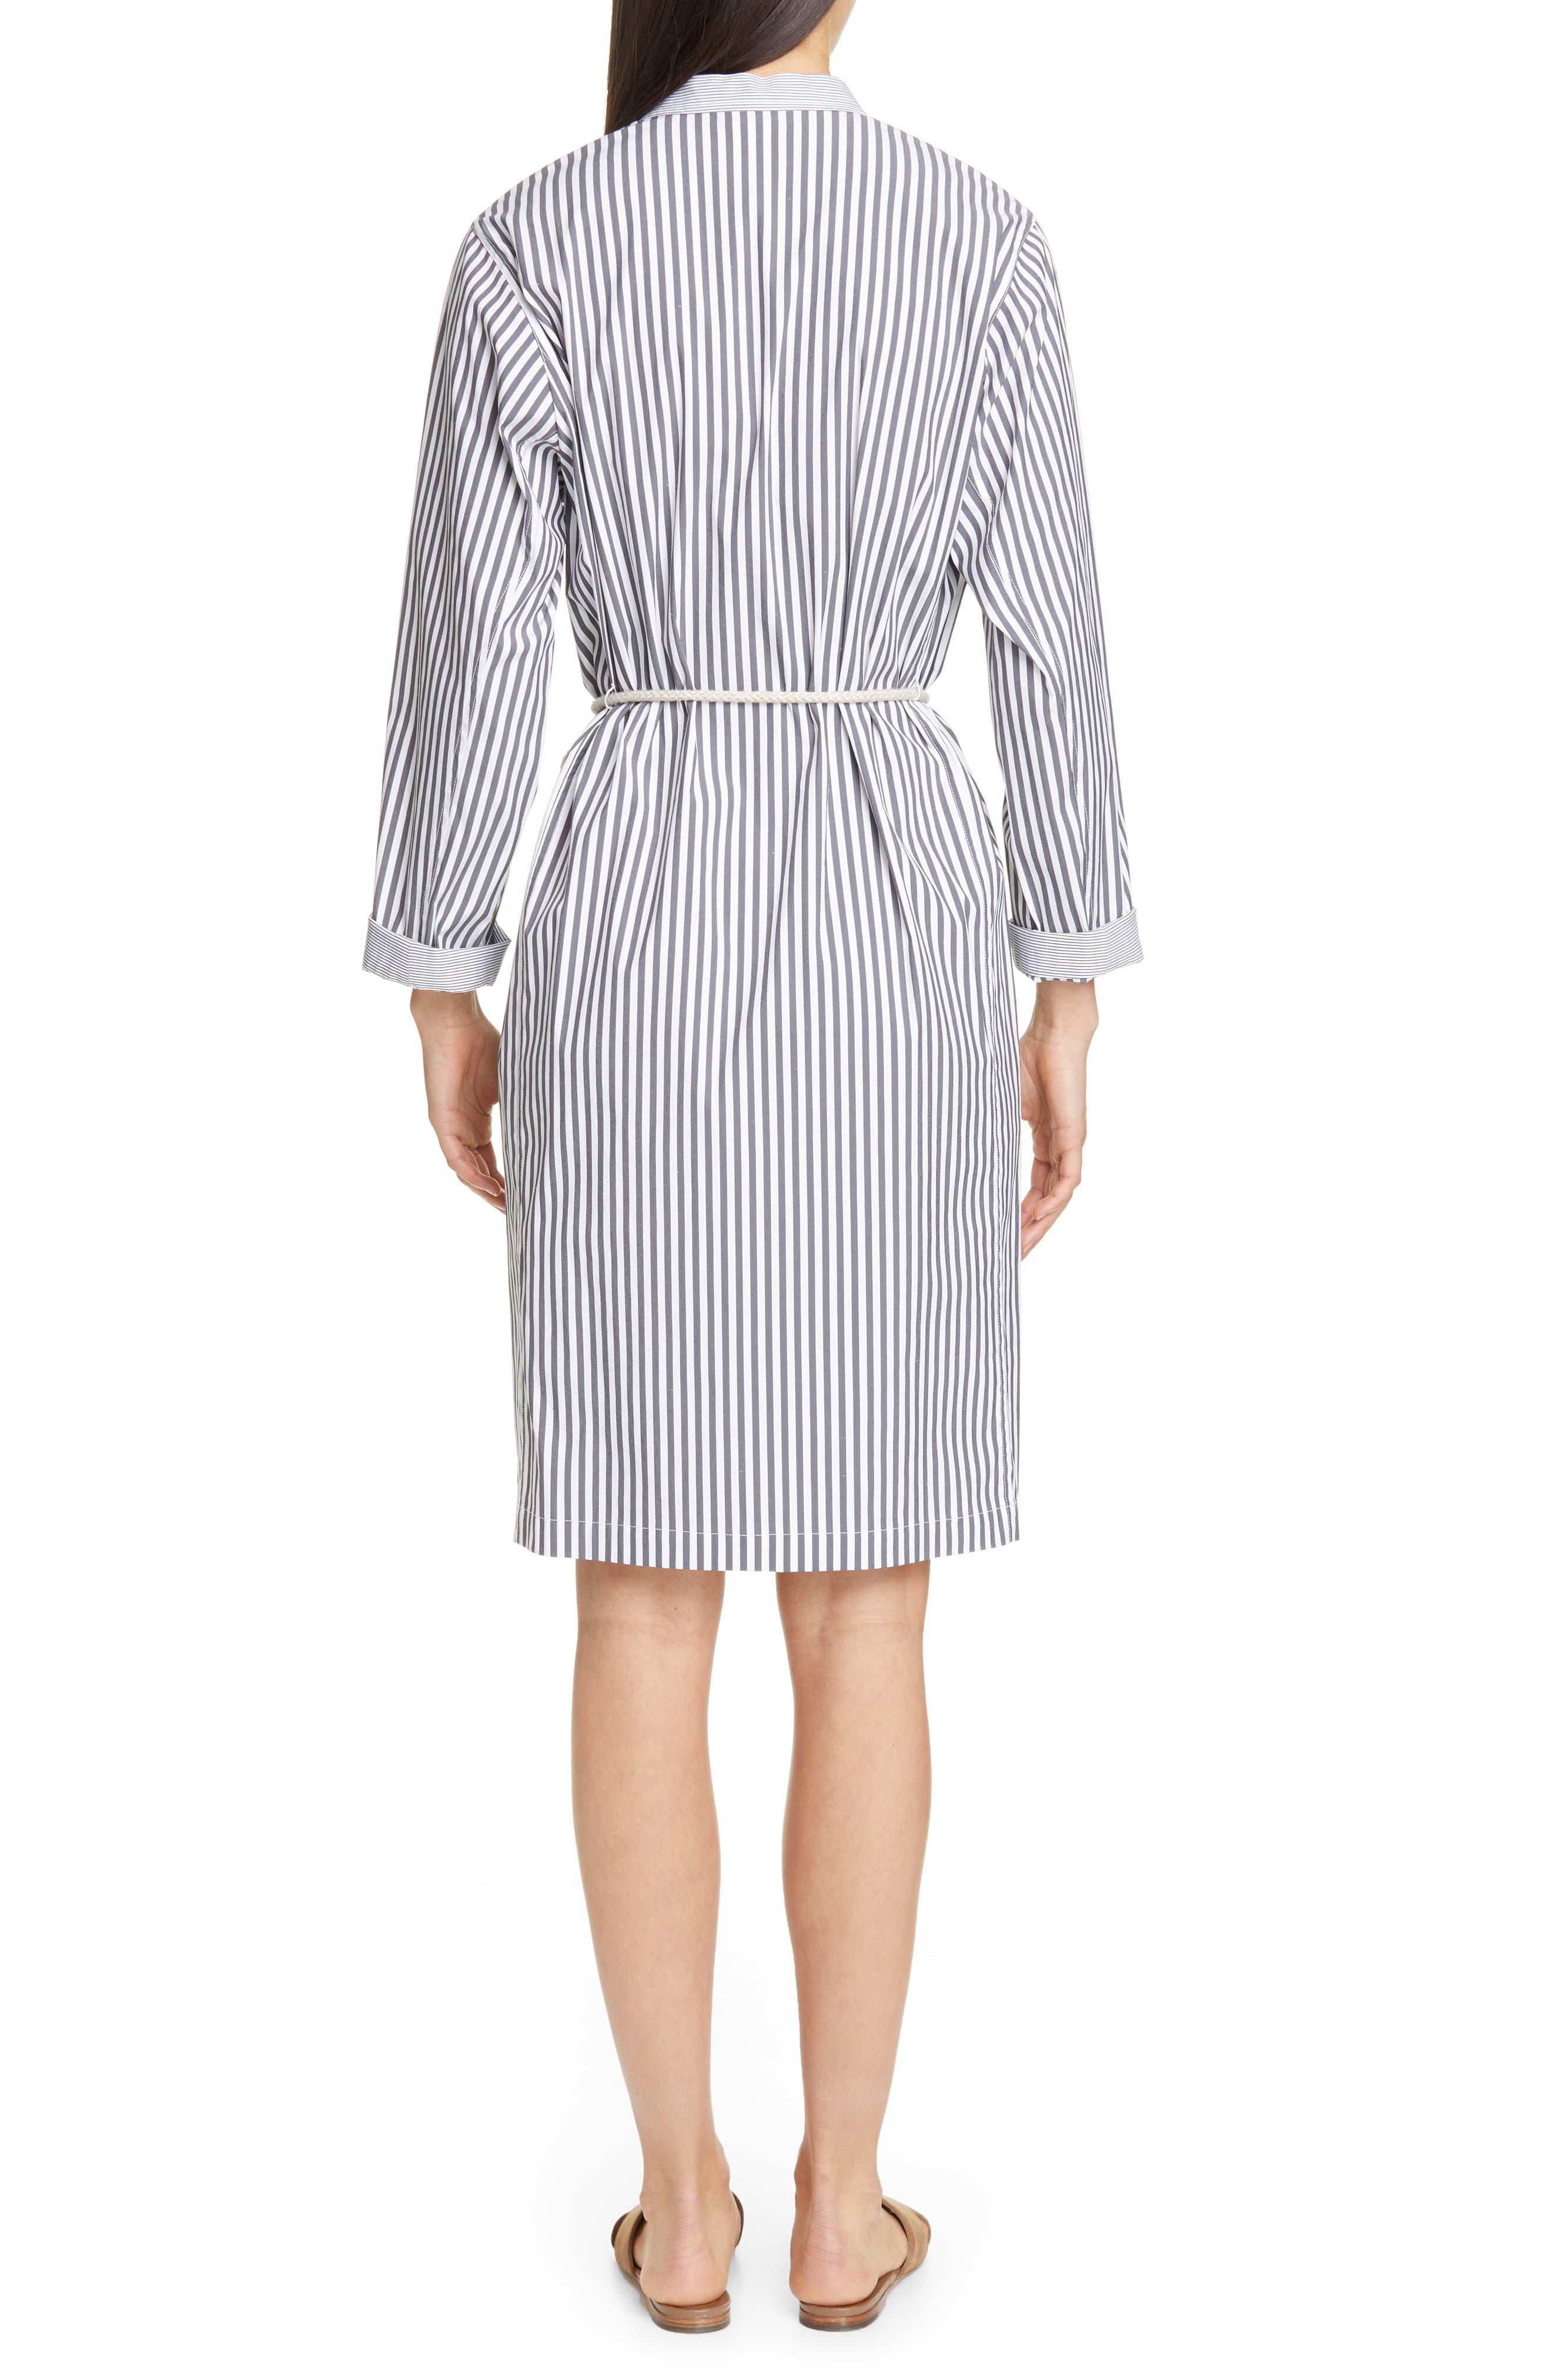 LAFAYETTE 148 NEW YORK, Rexana Stripe Long Sleeve Belted Shirtdress, Alternate thumbnail 2, color, ASH MULTI